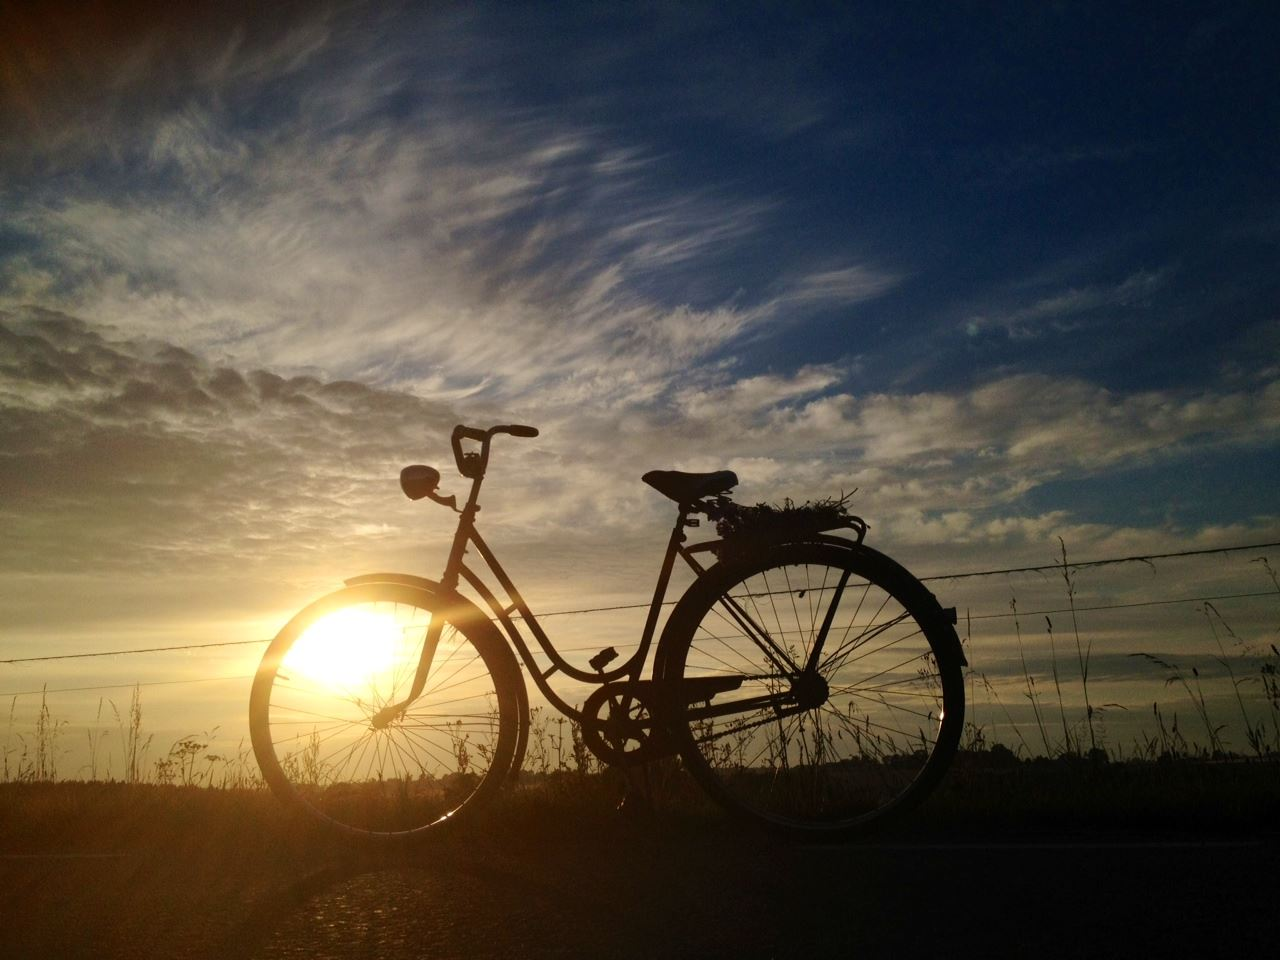 Johanna Stjernfeldt, Invigning Sydkustleden - Sveriges tredje nationella cykelled